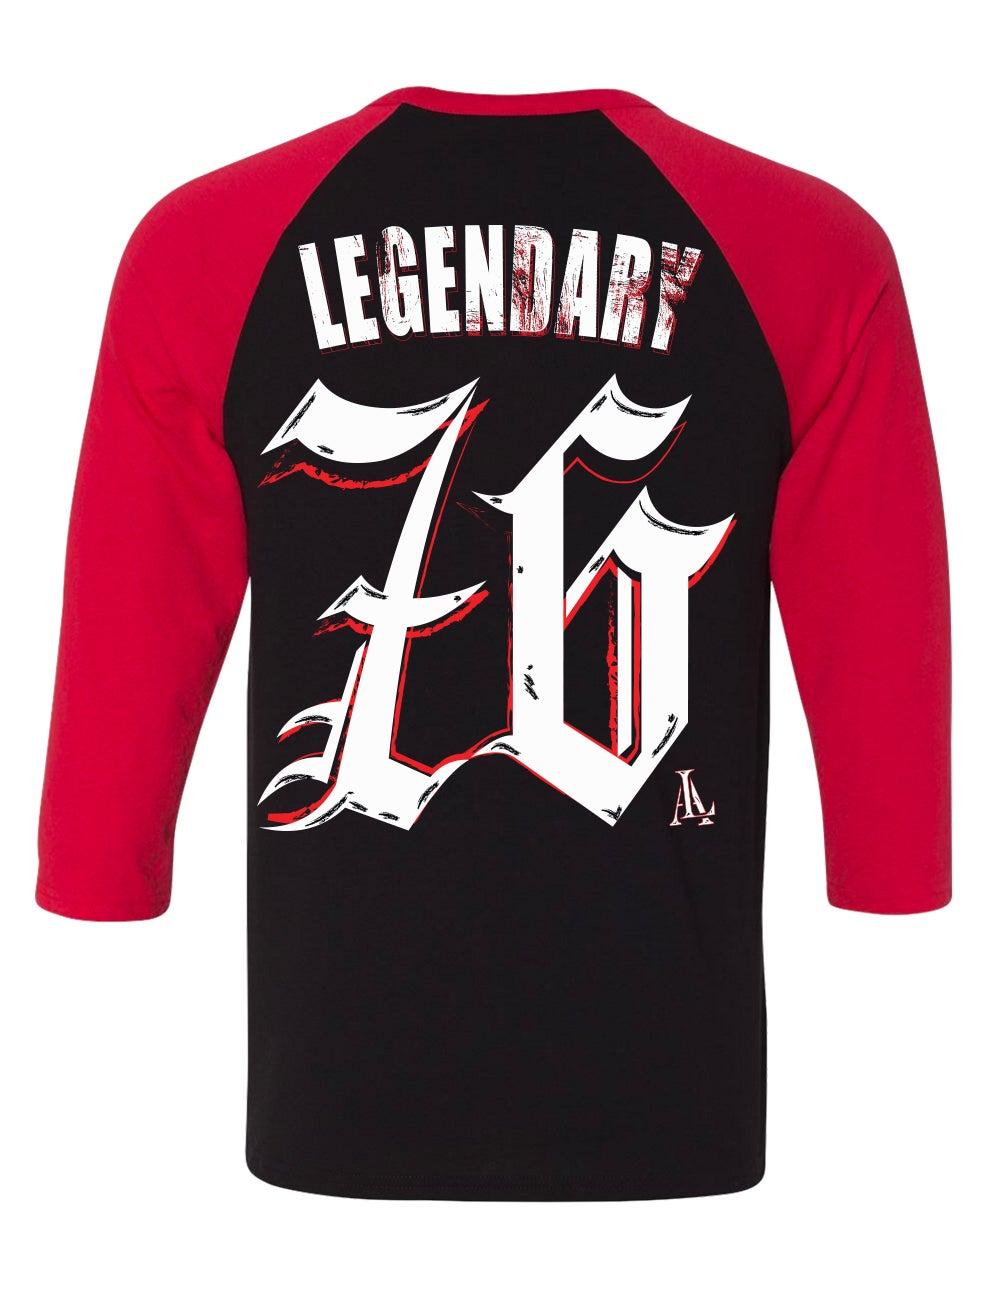 Image of Legendary American 76 raglan black and red